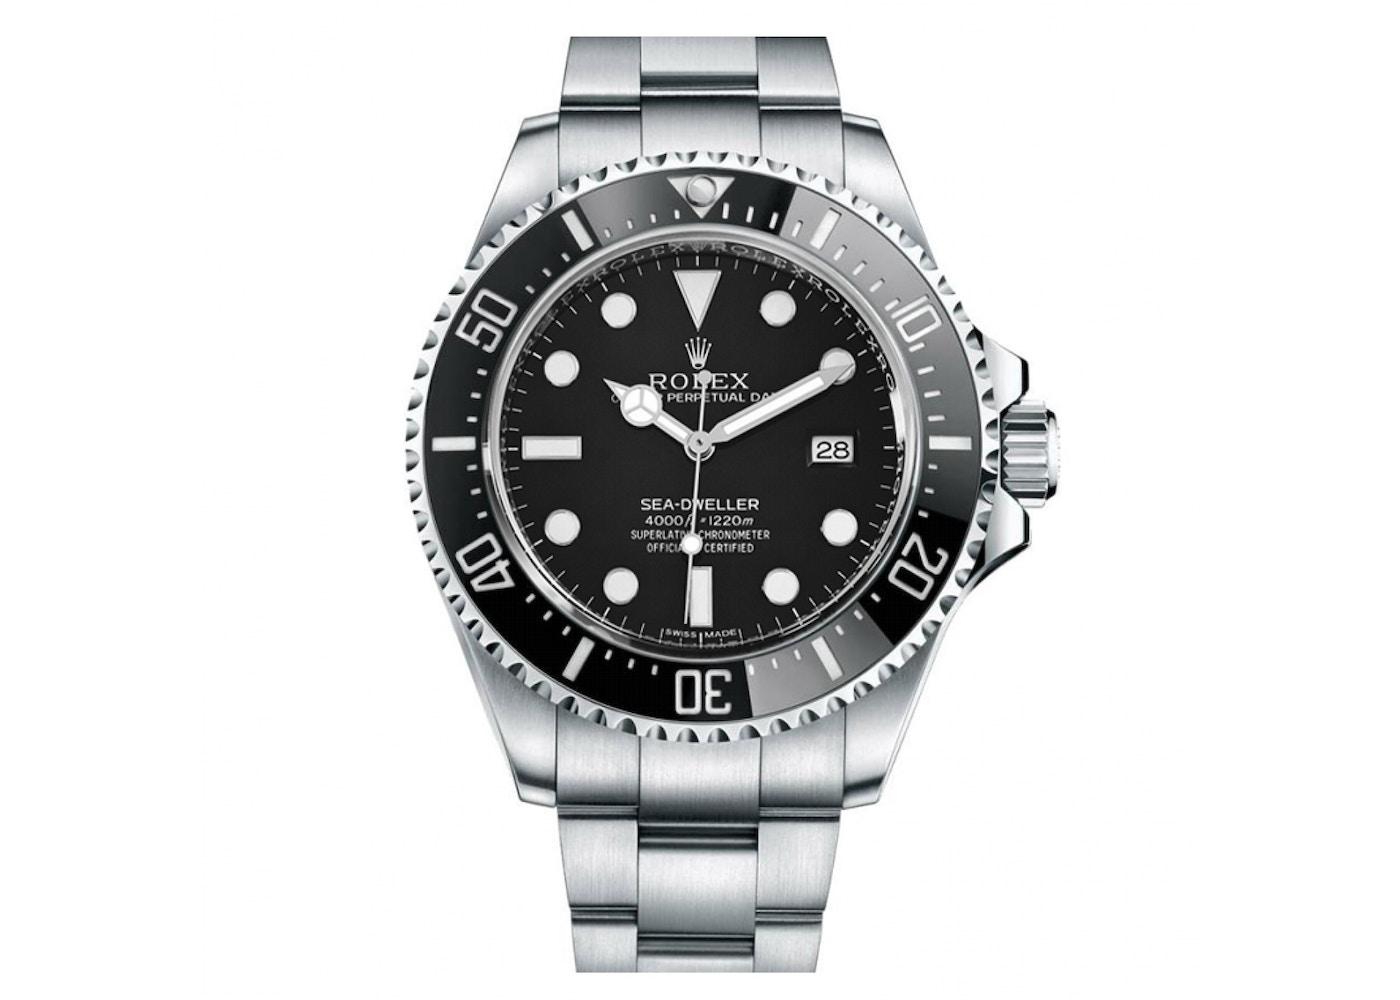 68ee5d89aaf Rolex Sea-Dweller 116600 - 40mm